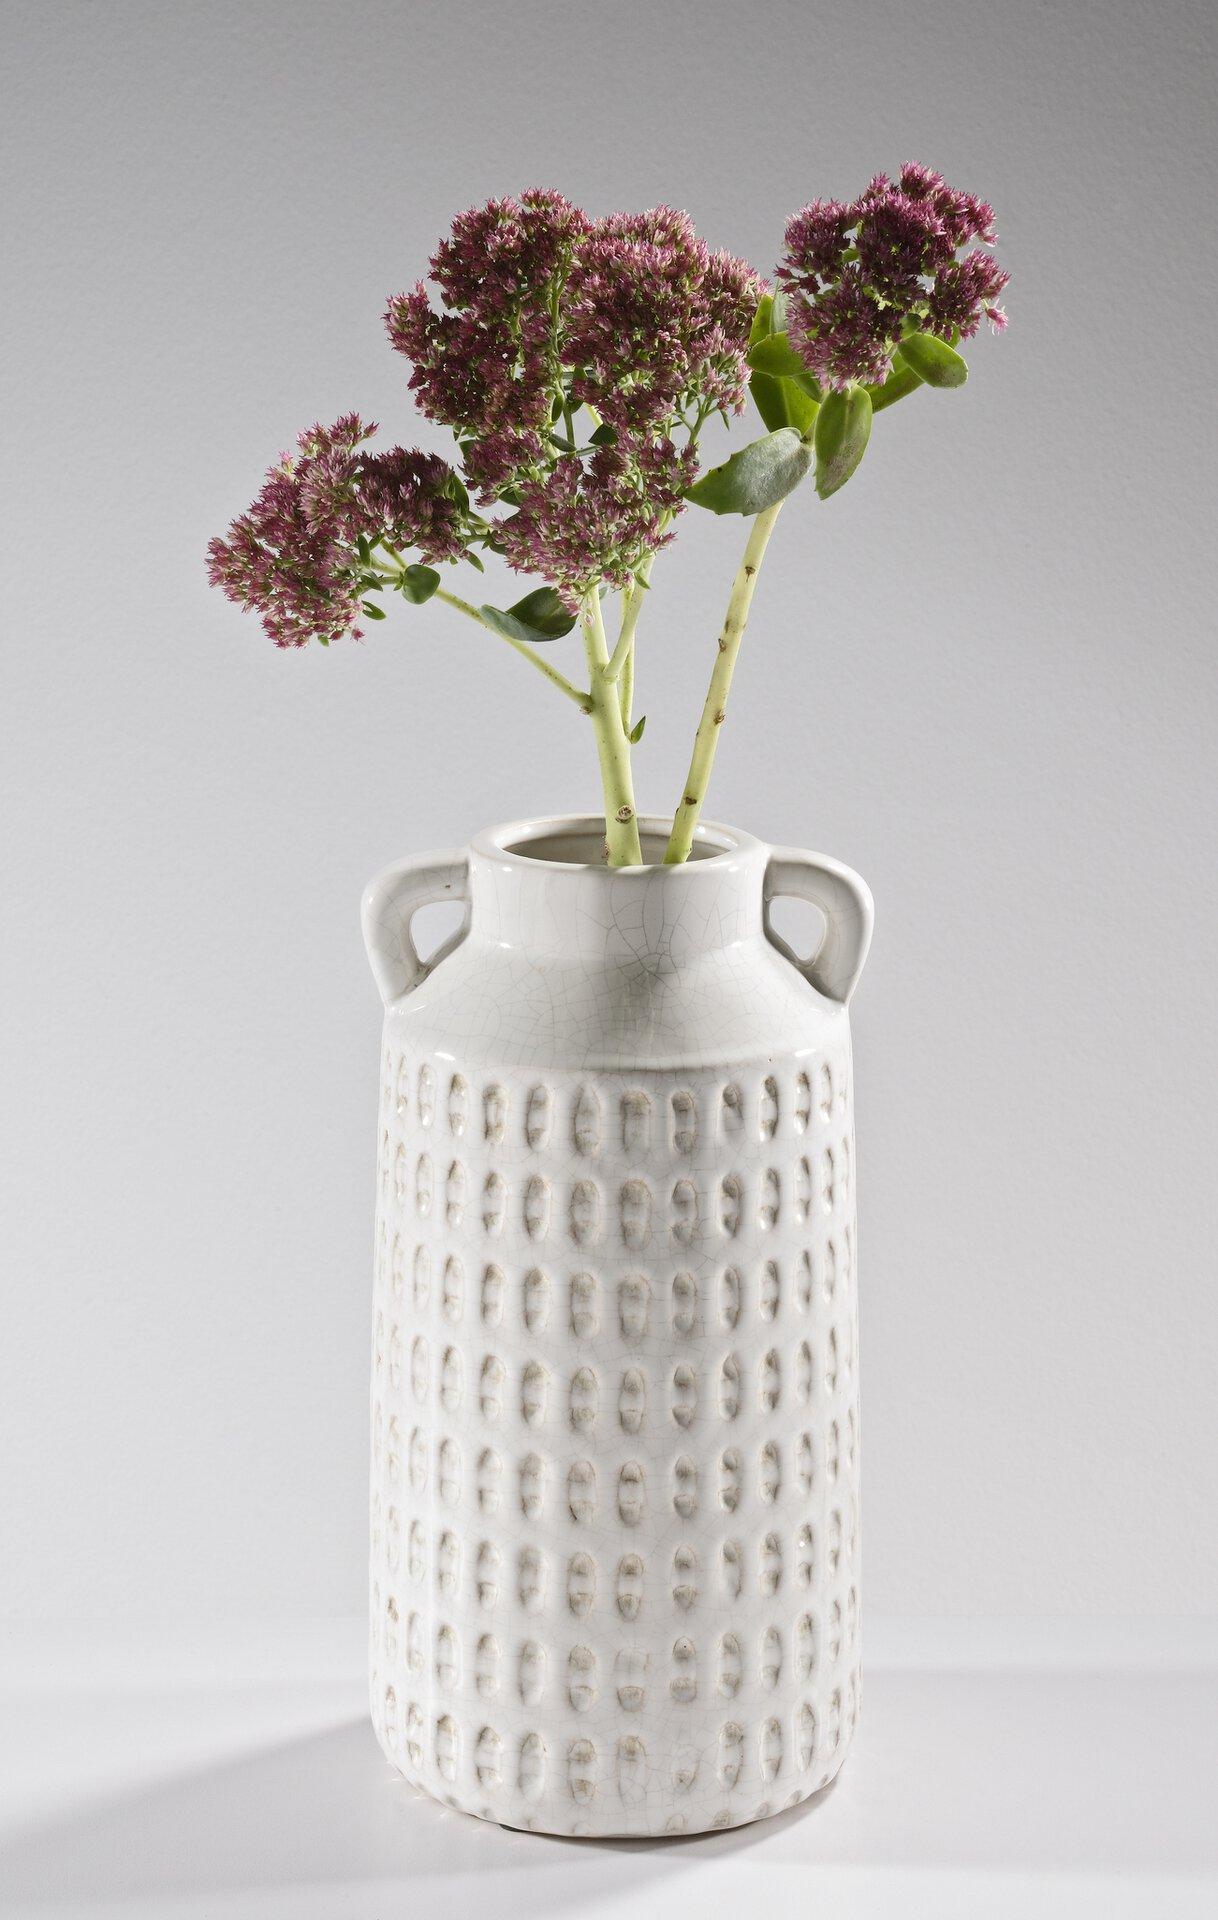 Vase 185111 Casa Nova Keramik weiß 17 x 30 x 15 cm